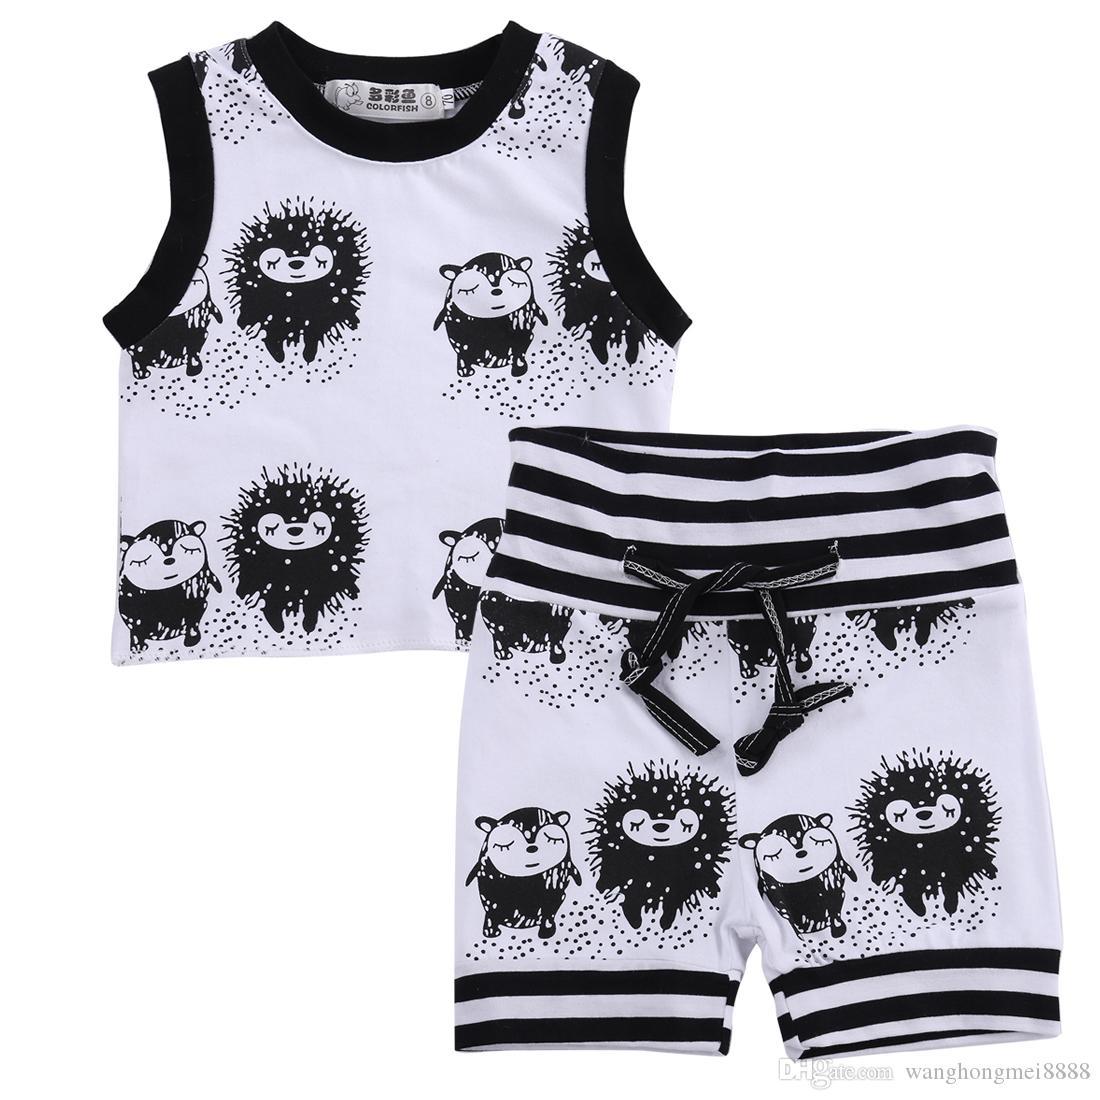 2019 Baby girl boy hedgehog pattern clothes simple cute vest top t-shirt + shorts 2 piece set clothing set